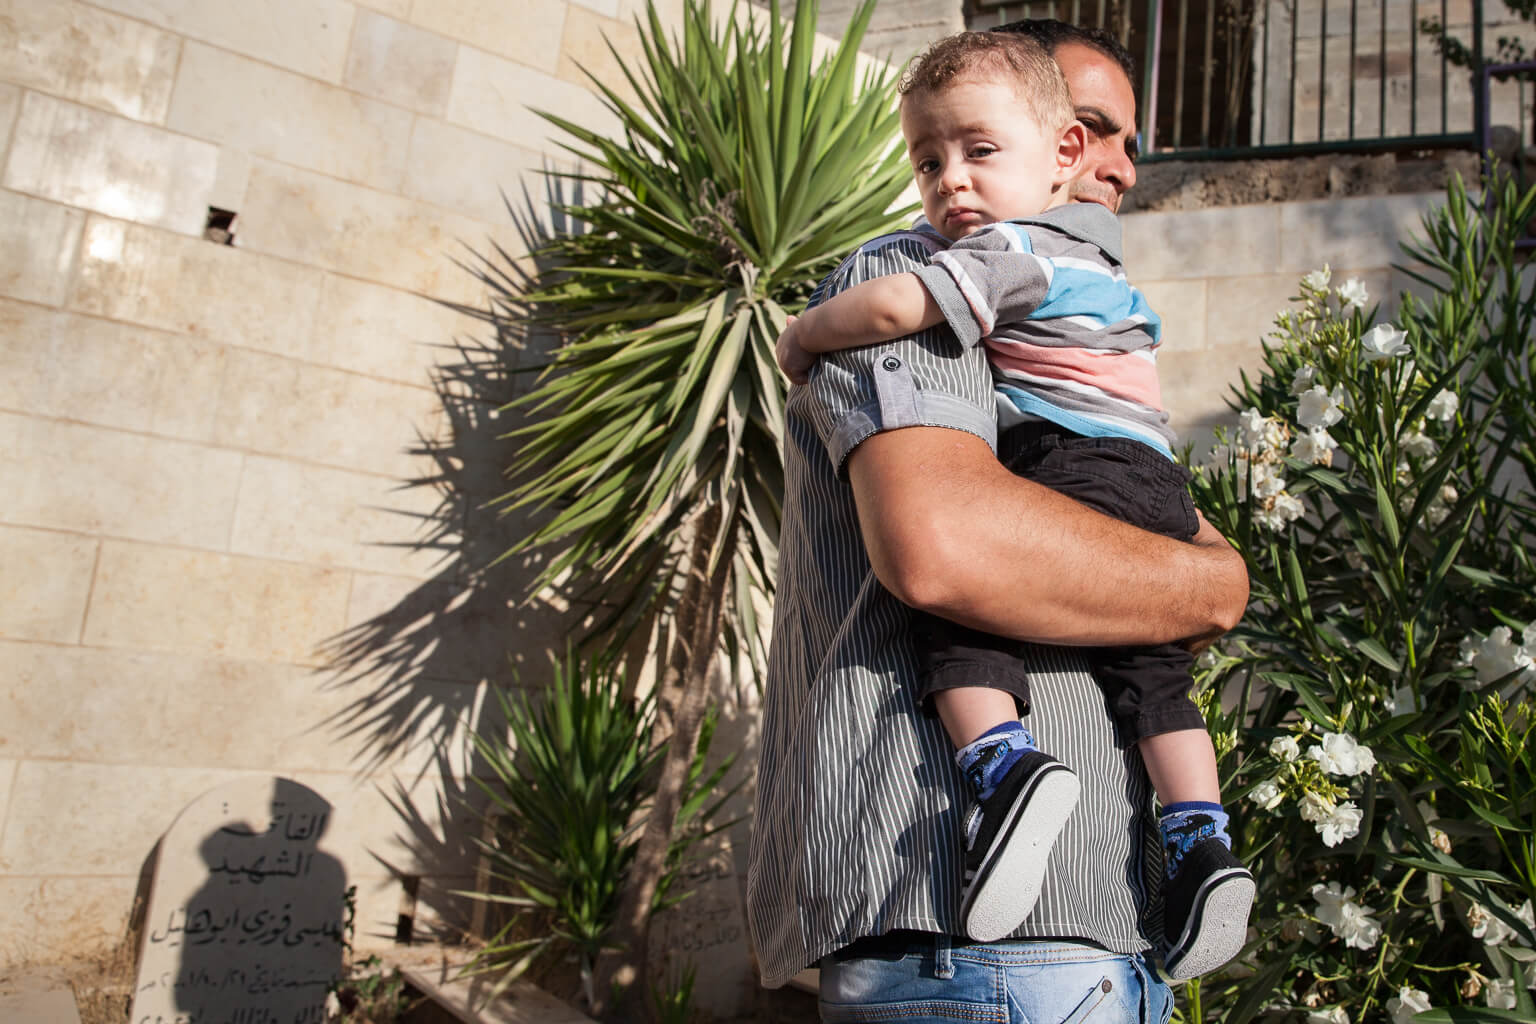 Iyad Al-Dibbis and his son. (Photo: Rebecca George)